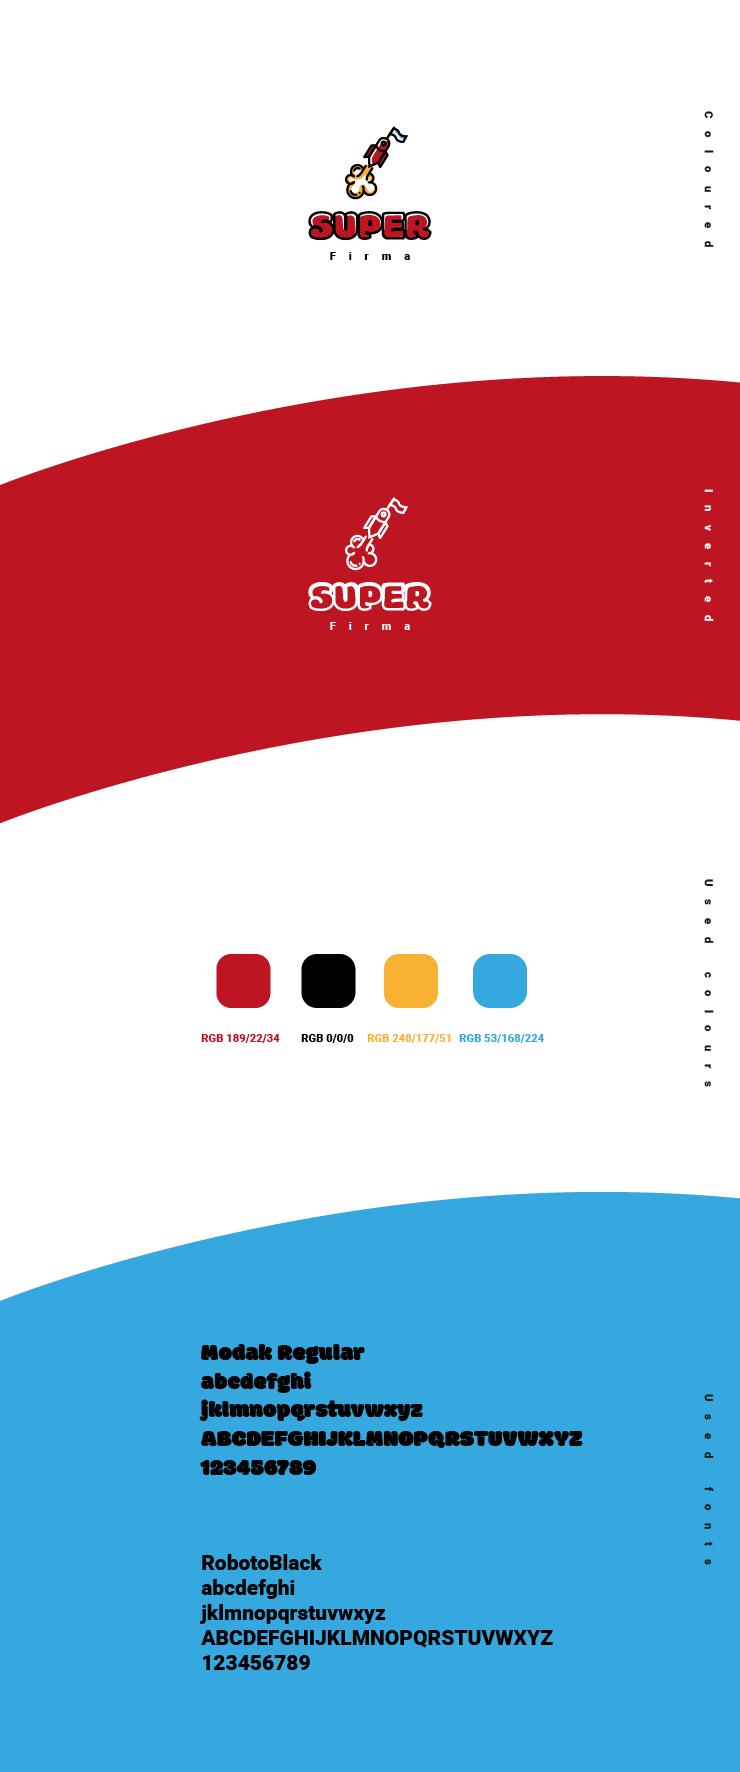 super firma IT company logo